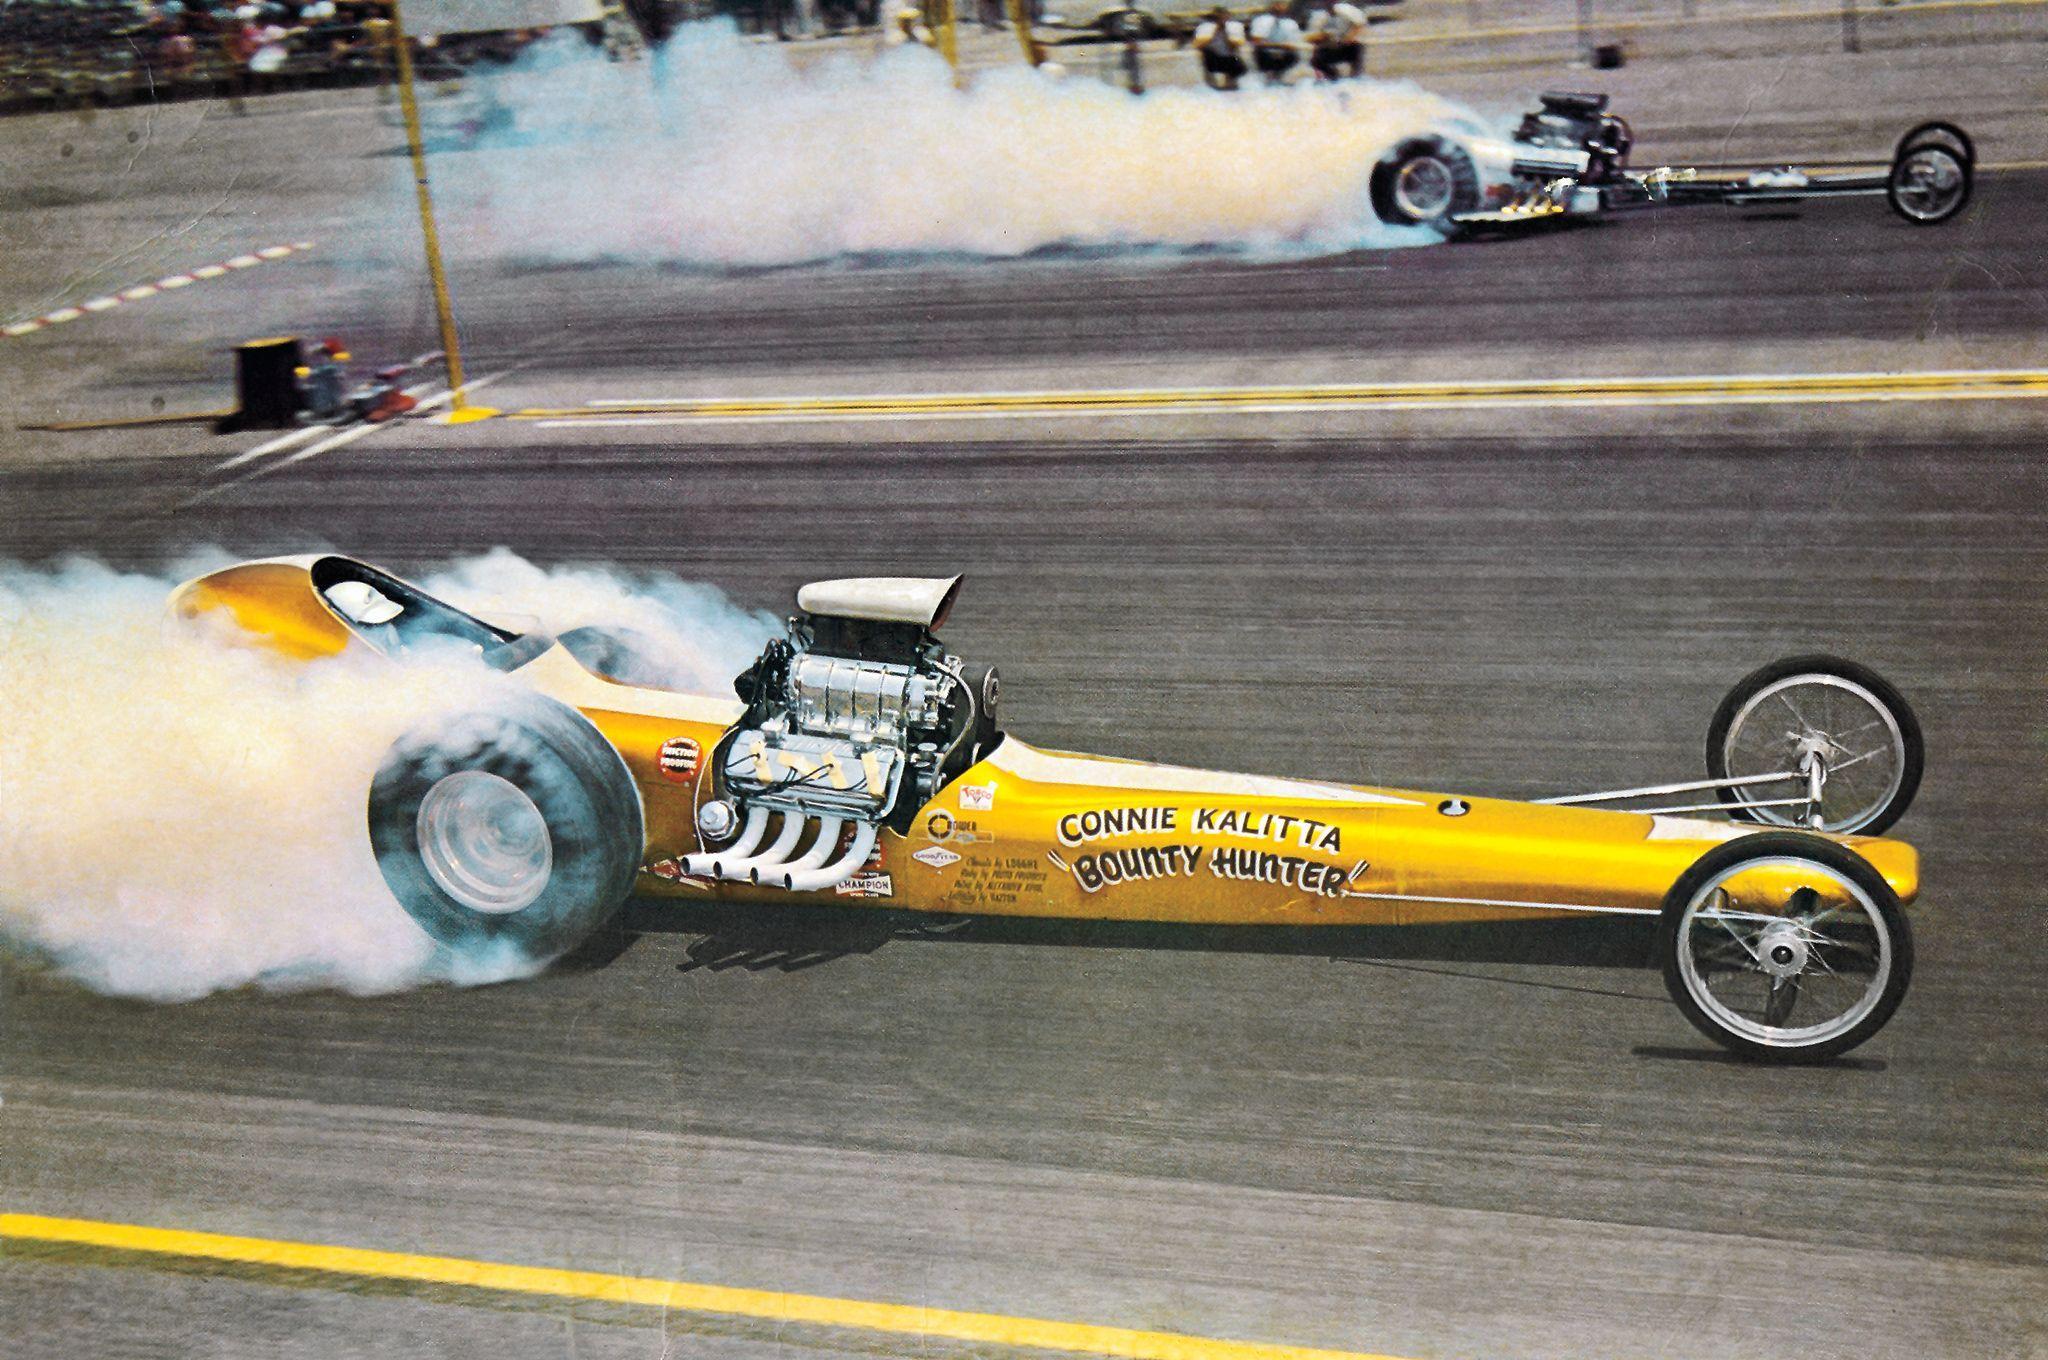 Pin by OneSixFour on Racing \'50\'s - \'80\'s Non-NASCAR | Pinterest ...